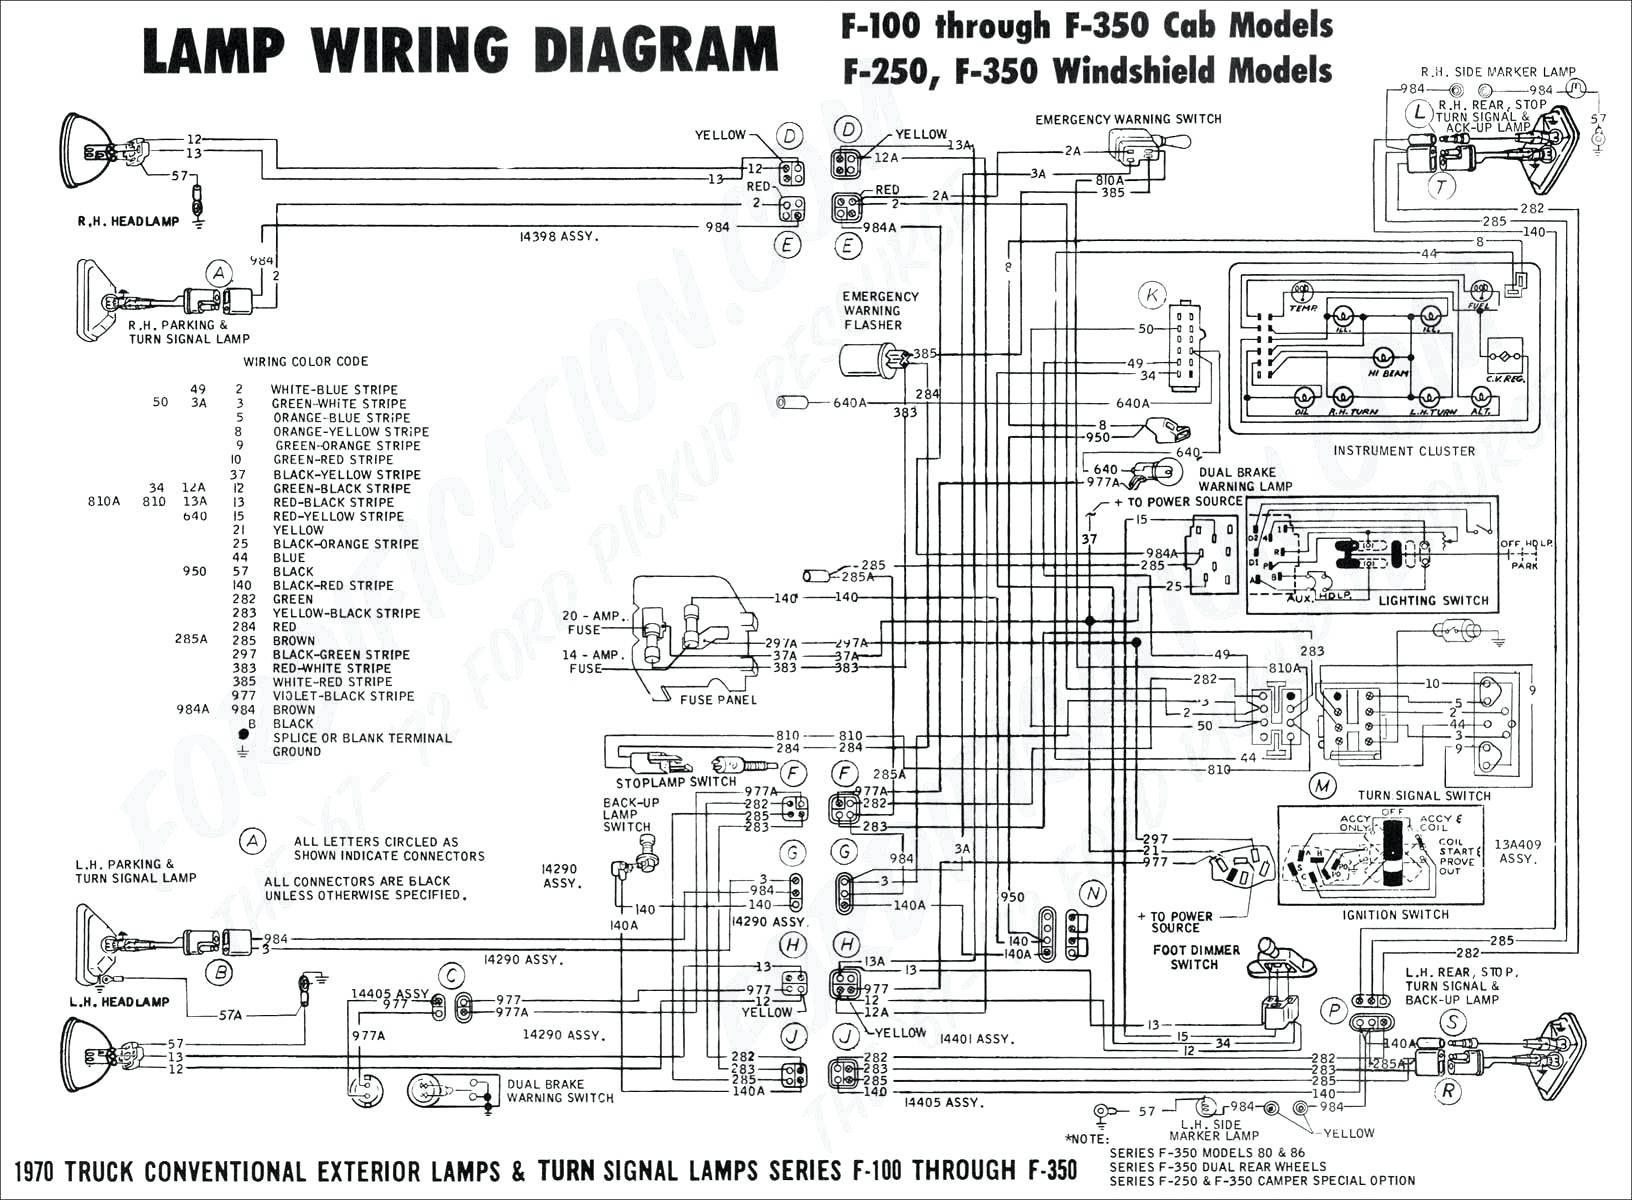 DIAGRAM] Opel Corsa A Wiring Diagram FULL Version HD Quality Wiring Diagram  - GANTT-DIAGRAMM.SUMMERCIRCUSBZ.ITSummer Circus 2014